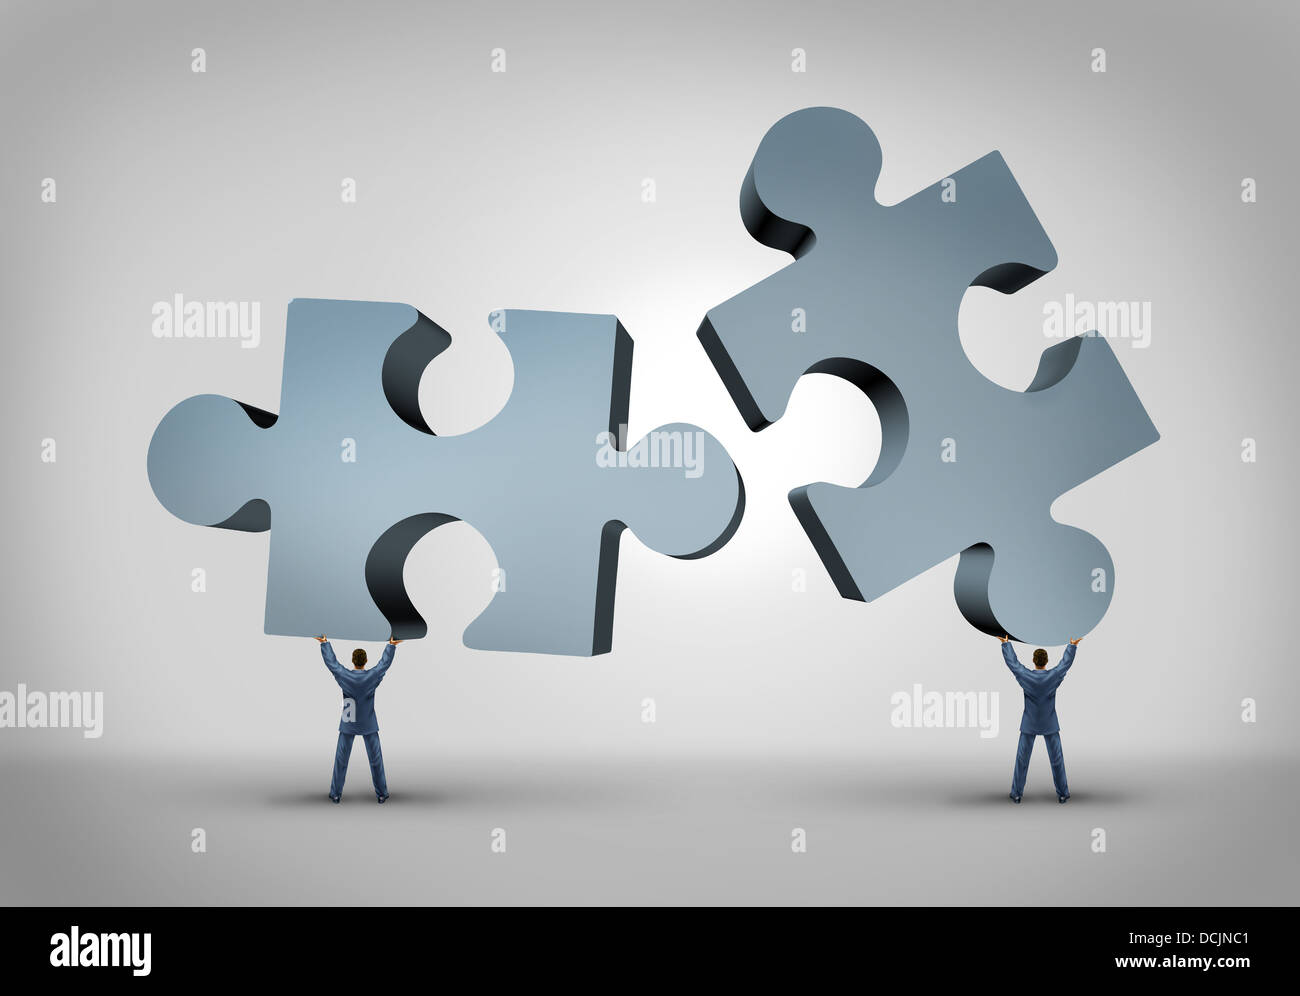 Business Teamwork Concept Jigsaw Puzzle Stockfotos & Business ...